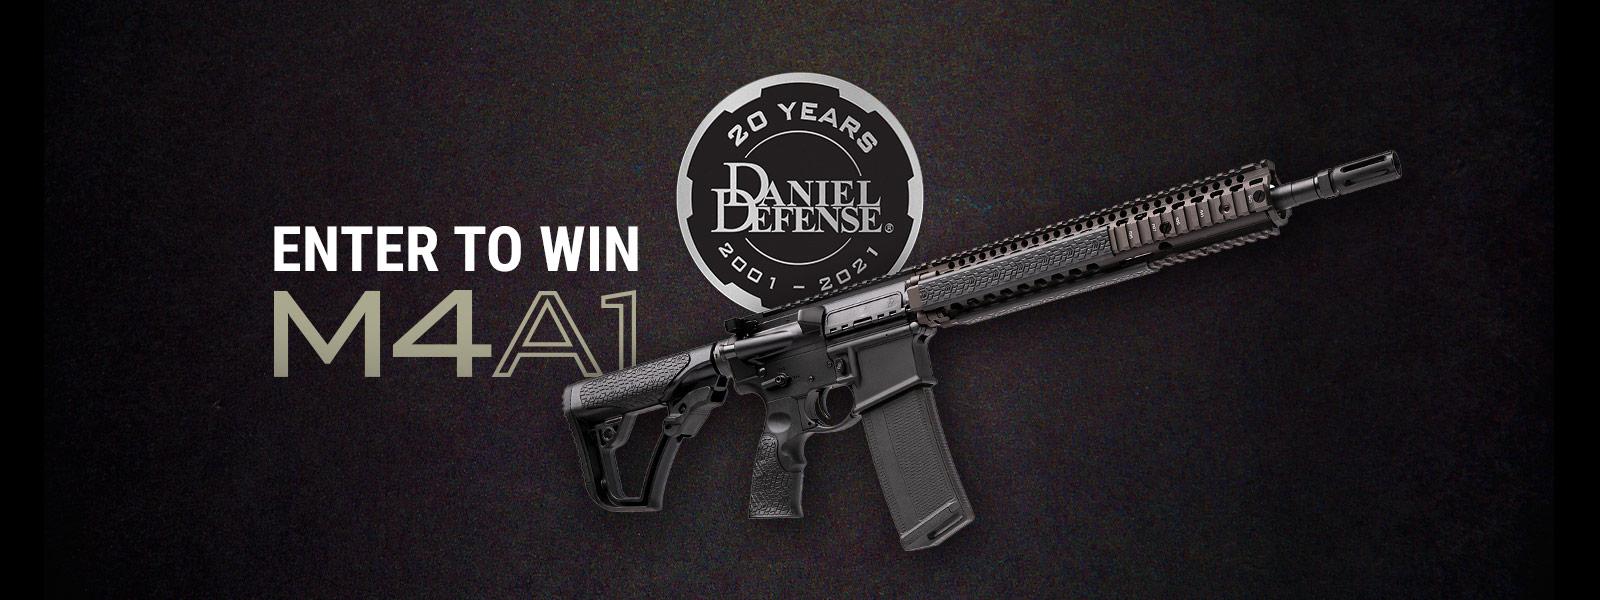 Daniel Defense Sweepstakes M4A1